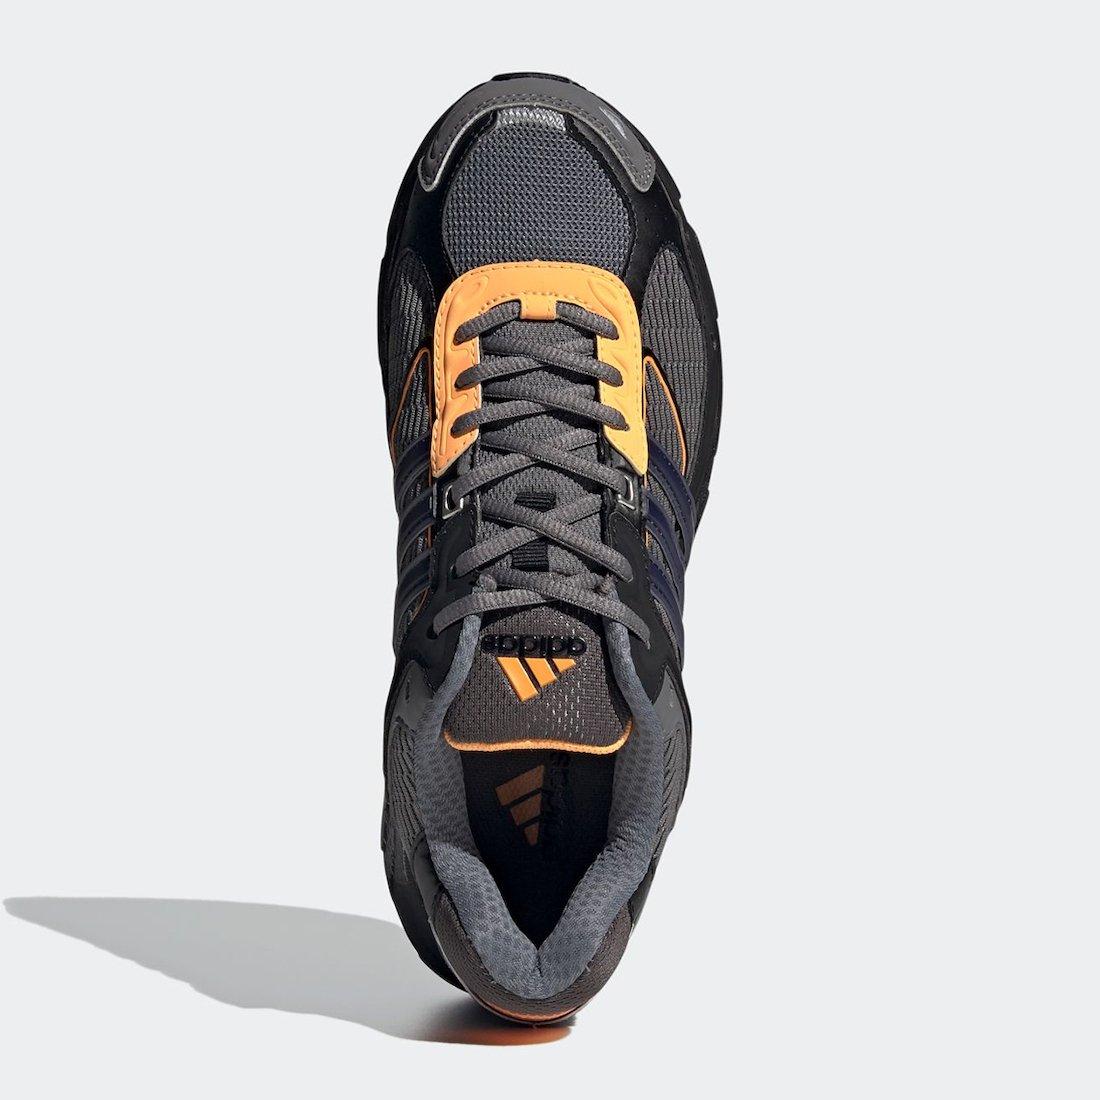 adidas Response CL Grey Flash Orange FX7725 Release Date Info